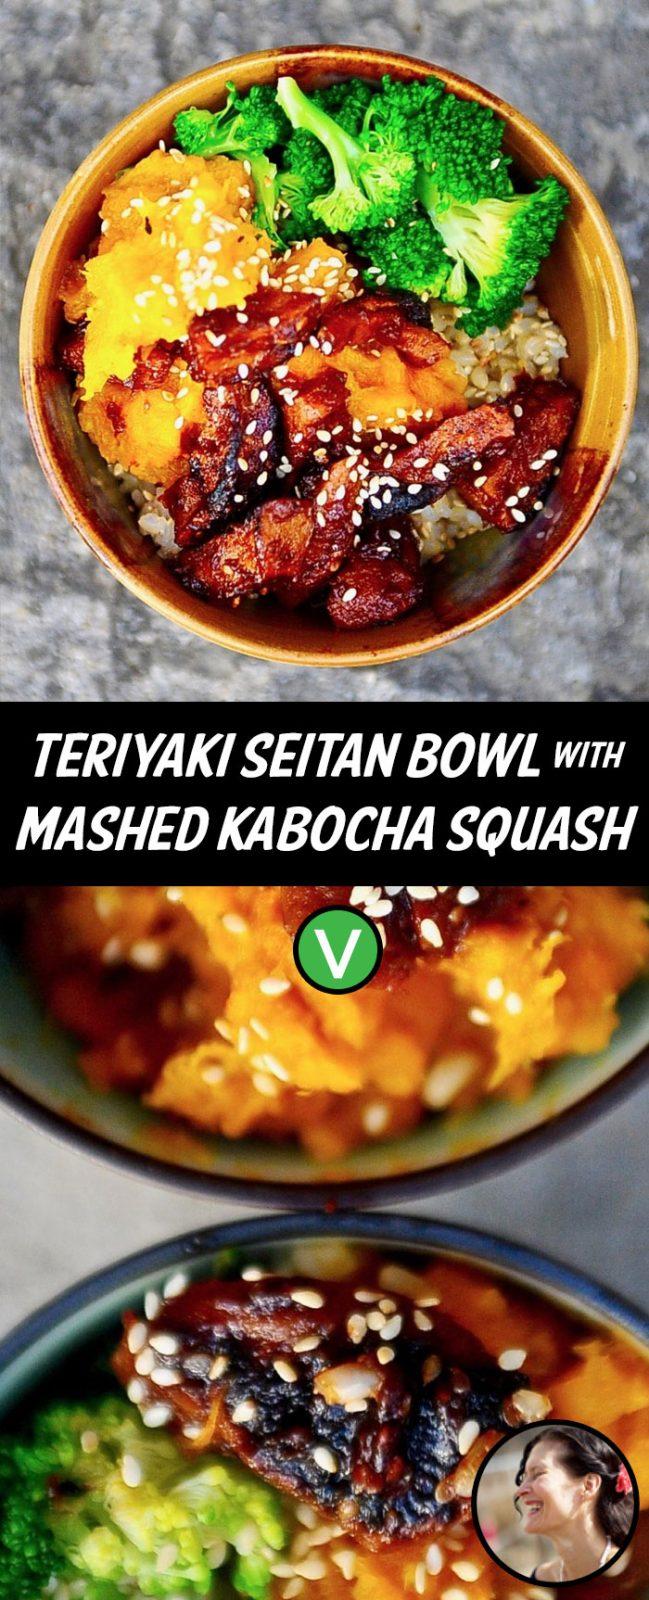 Teriyaki Seitan and Squash Bowl (Vegan)